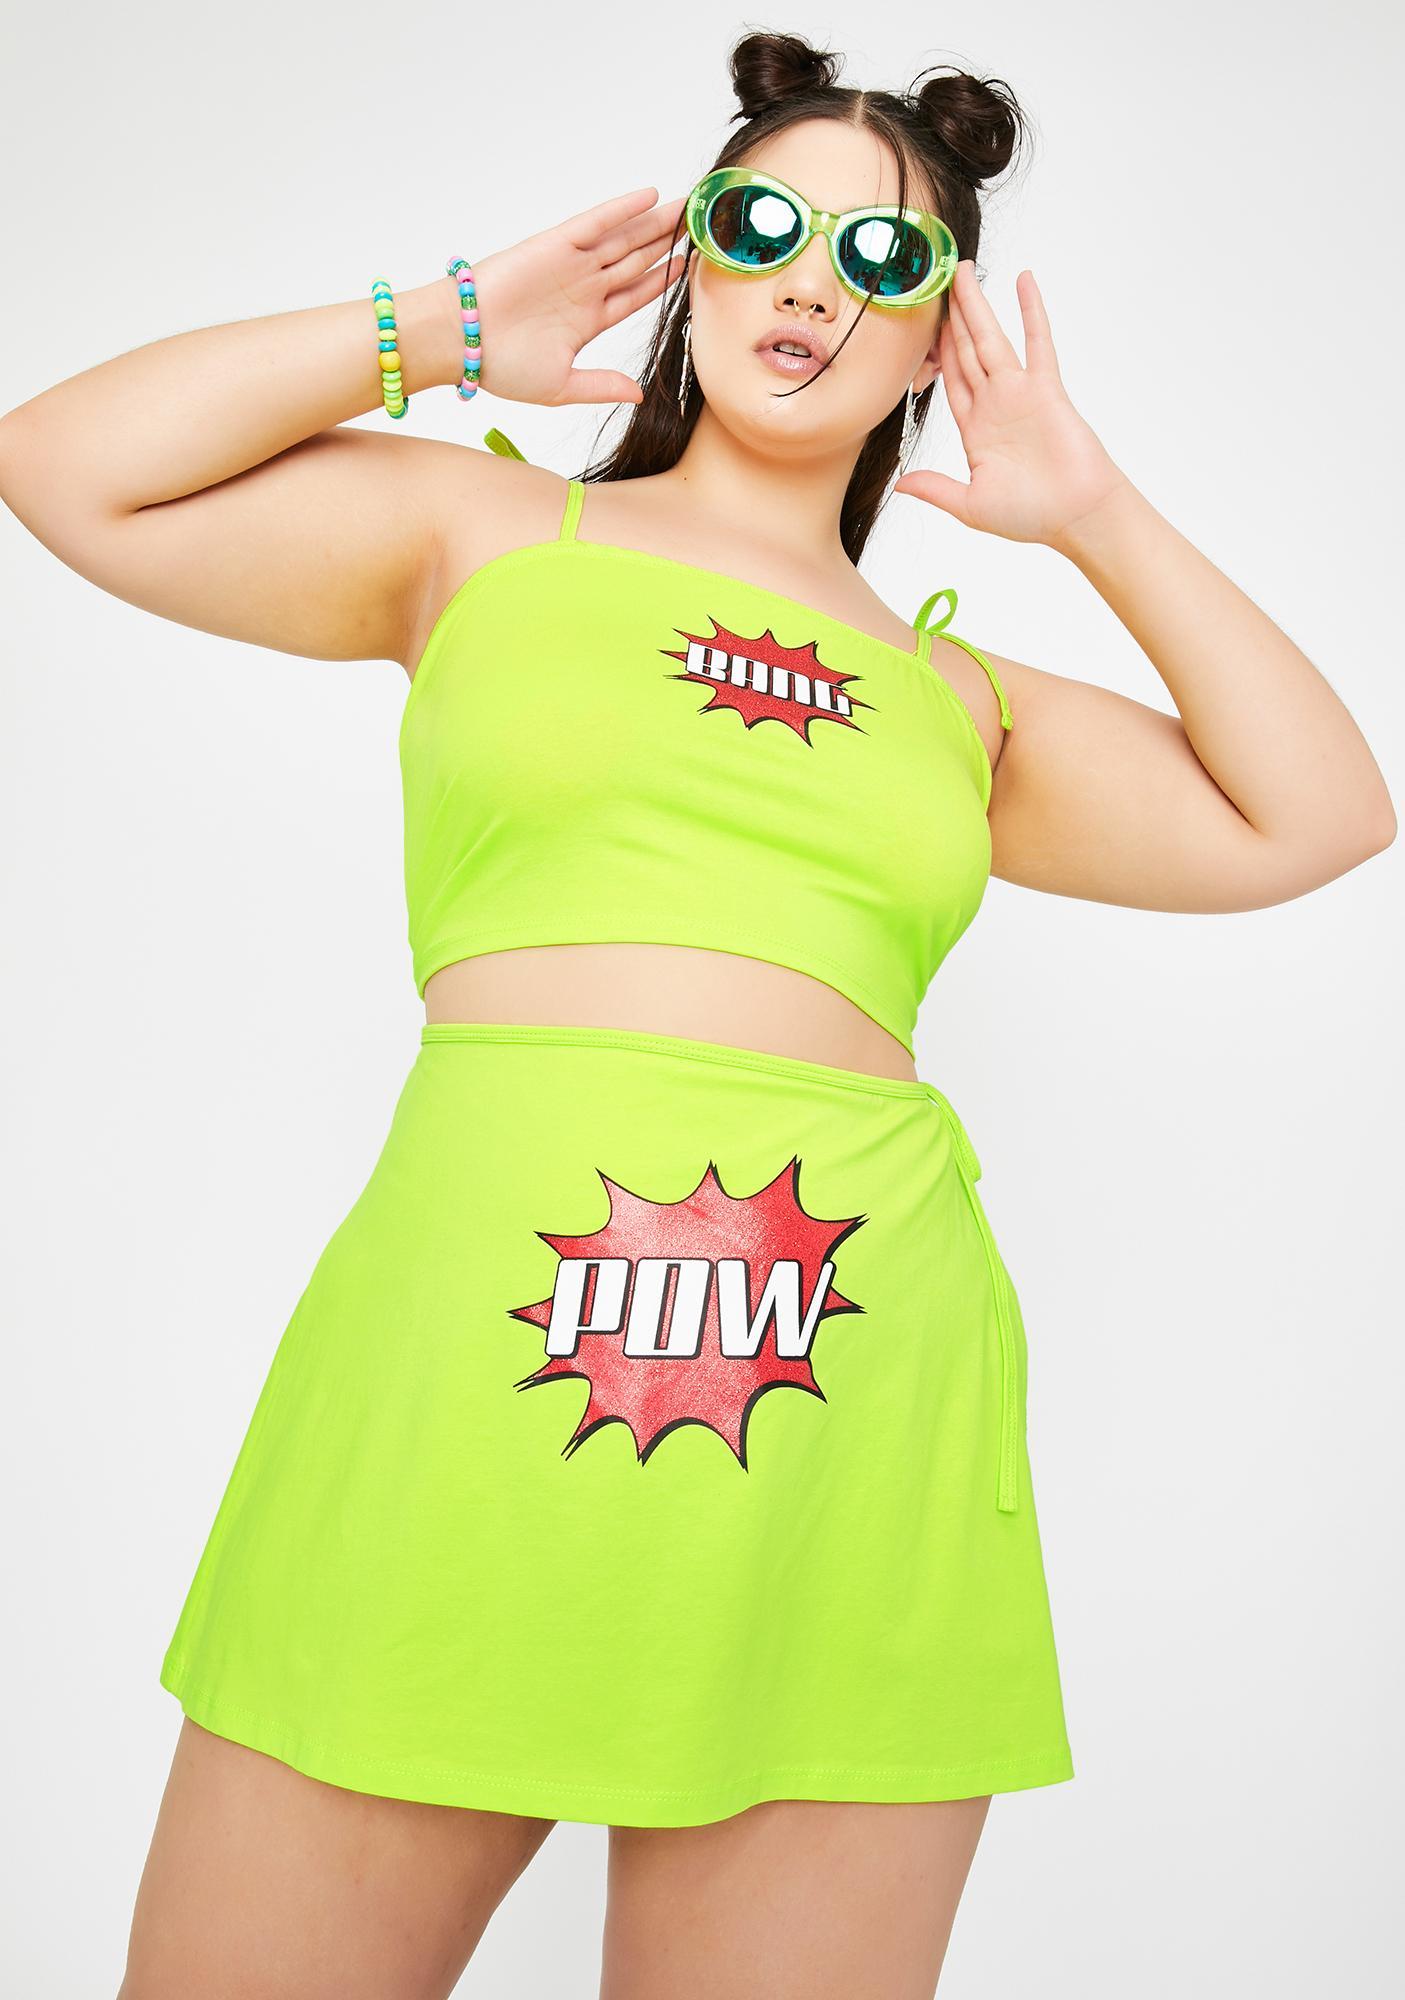 Club Exx Fierce Double Whammy Mini Skirt